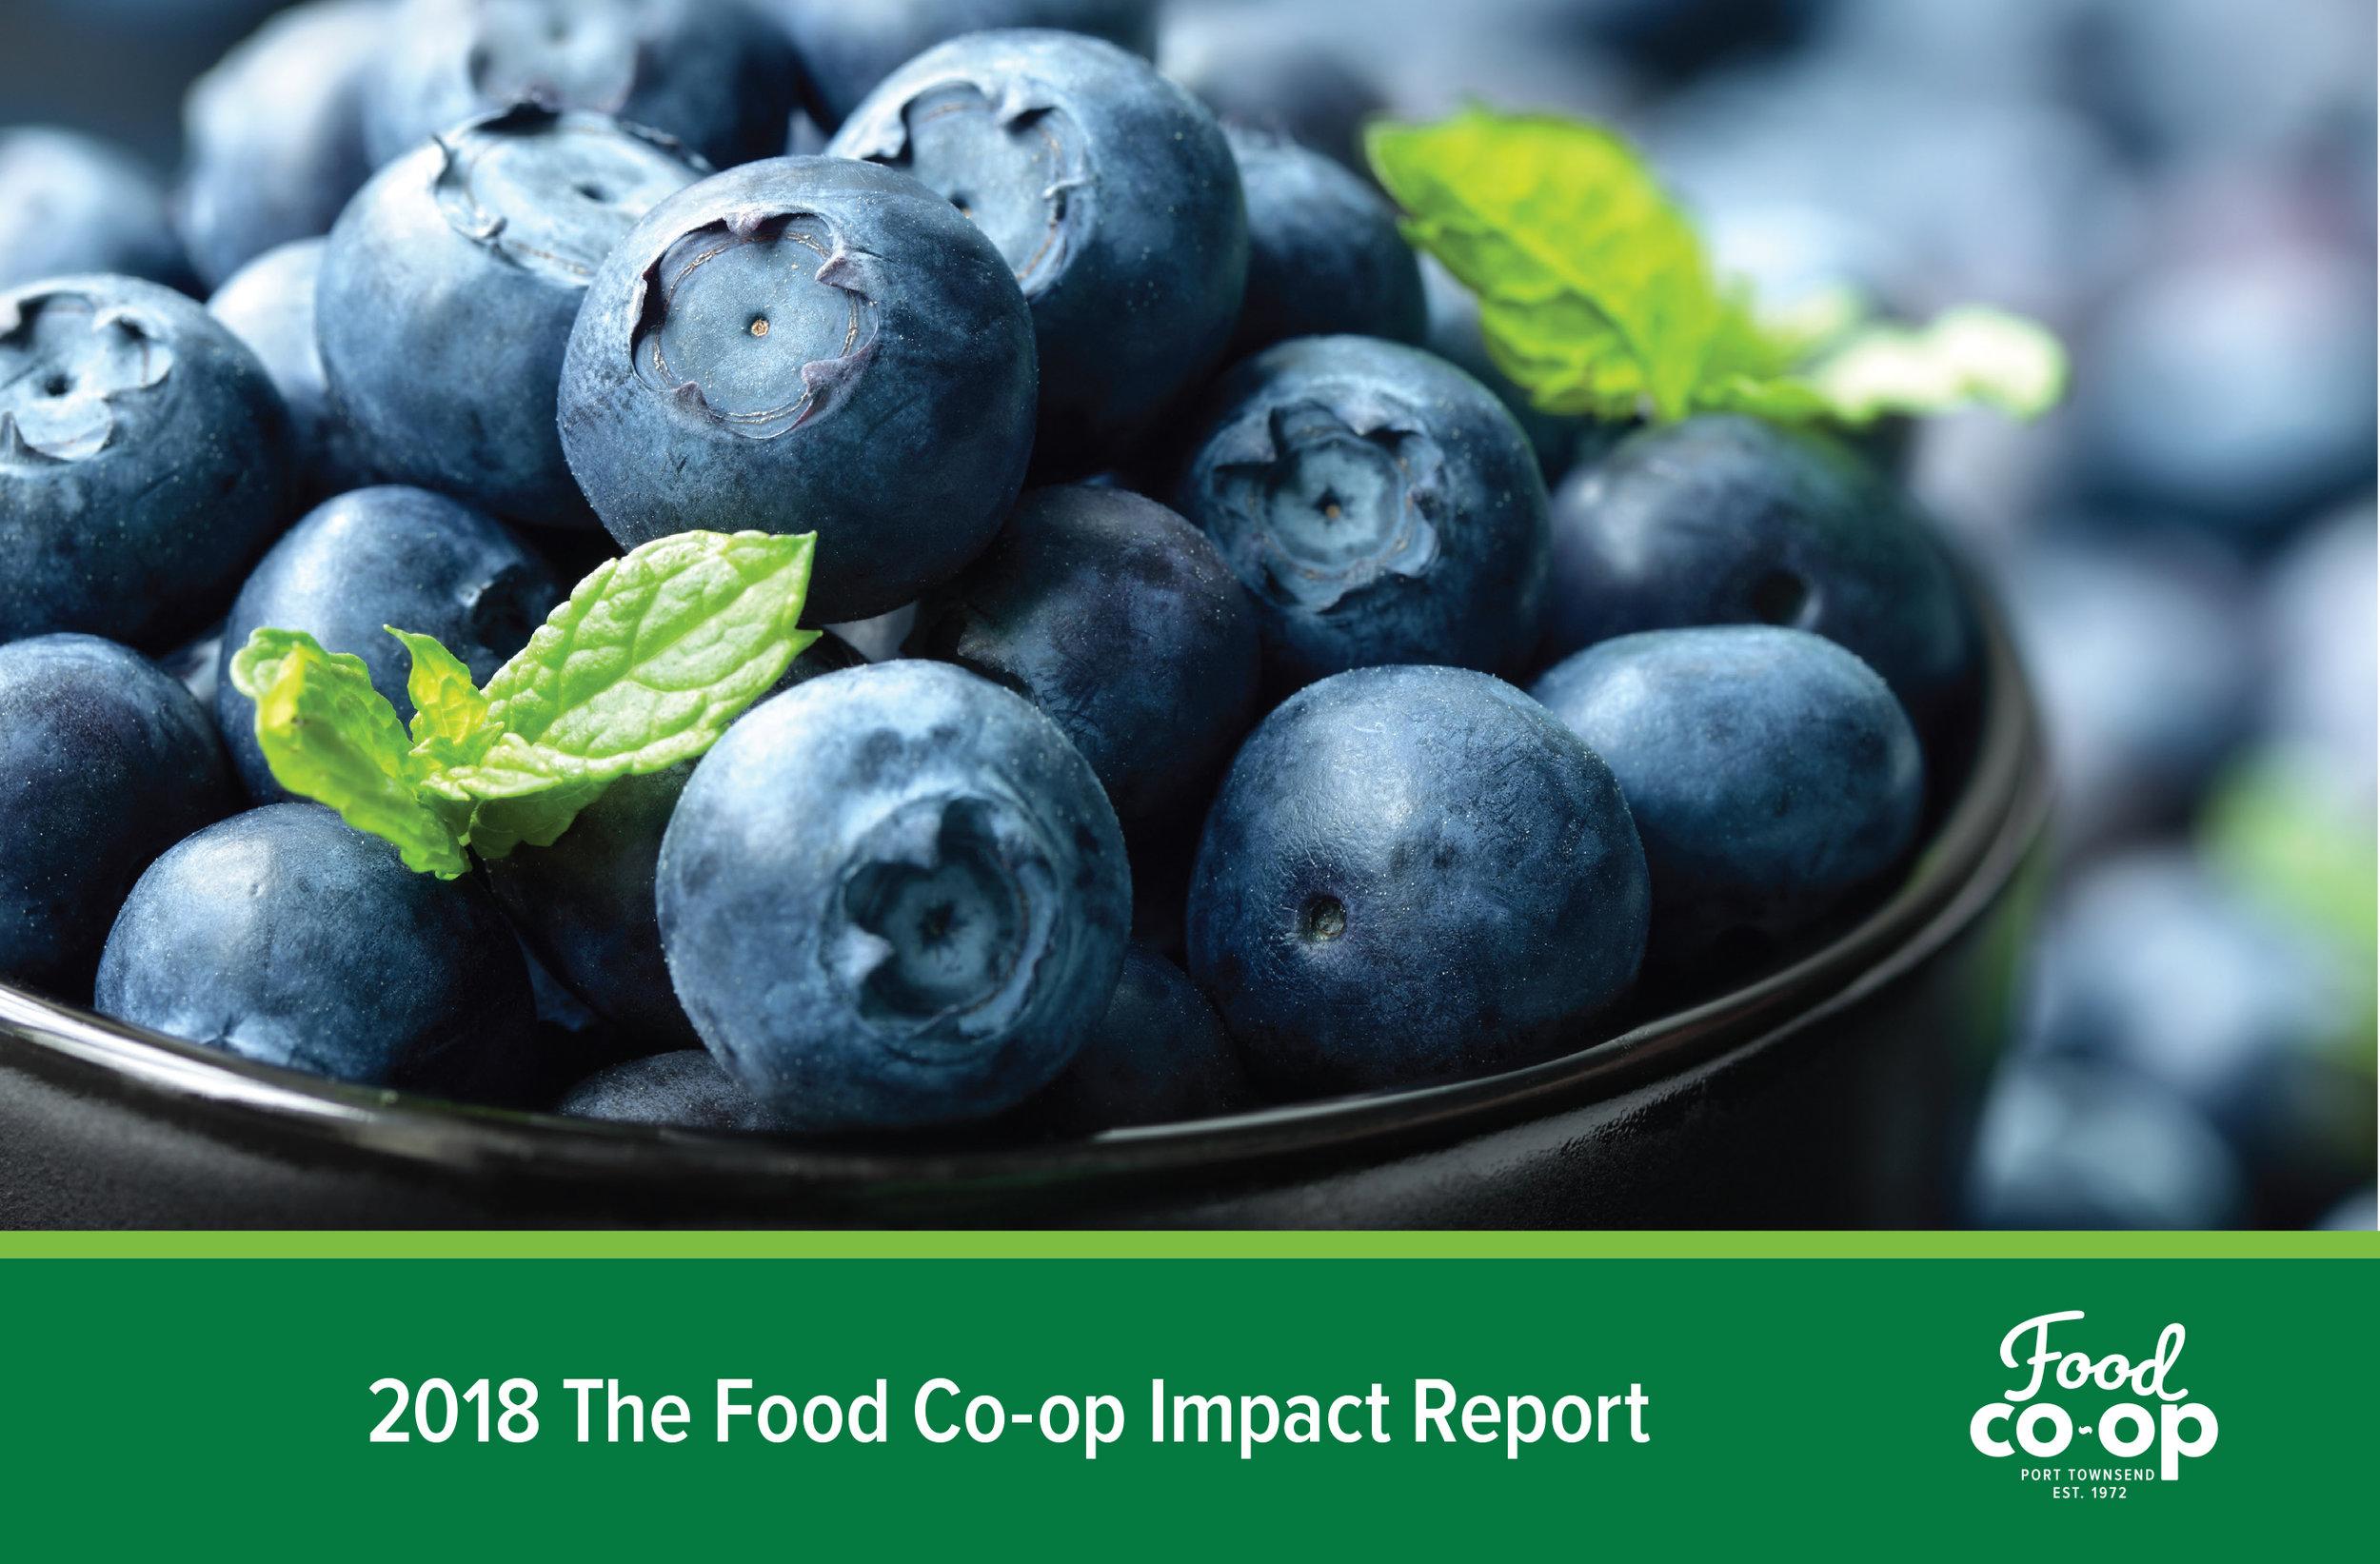 2018_Sustainability_Report_FoodCoop cover.jpg